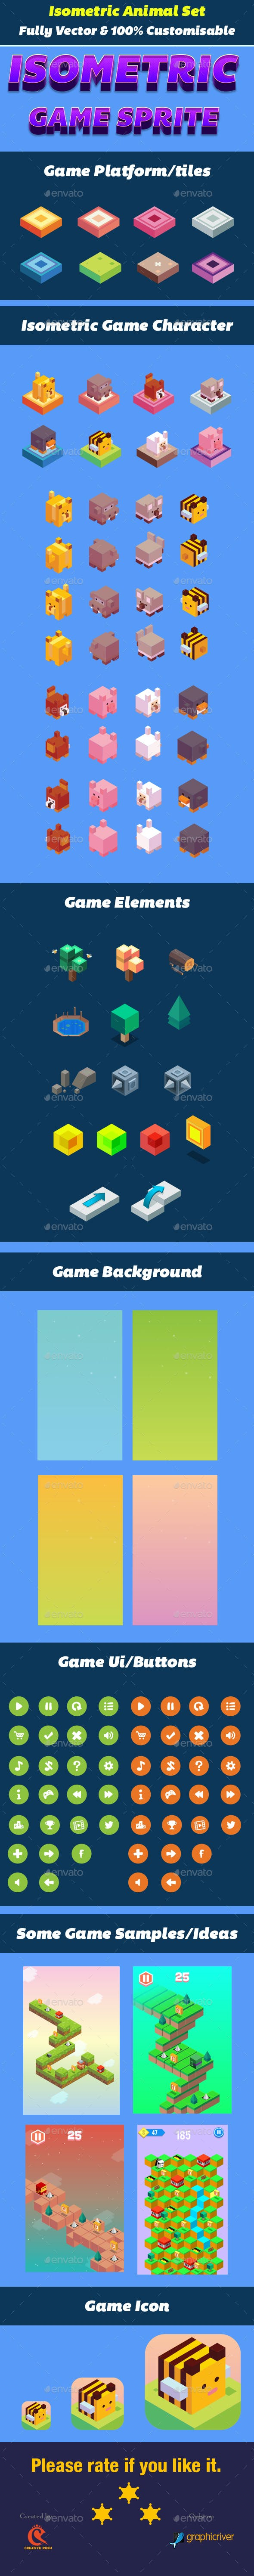 Isometric Animal Game